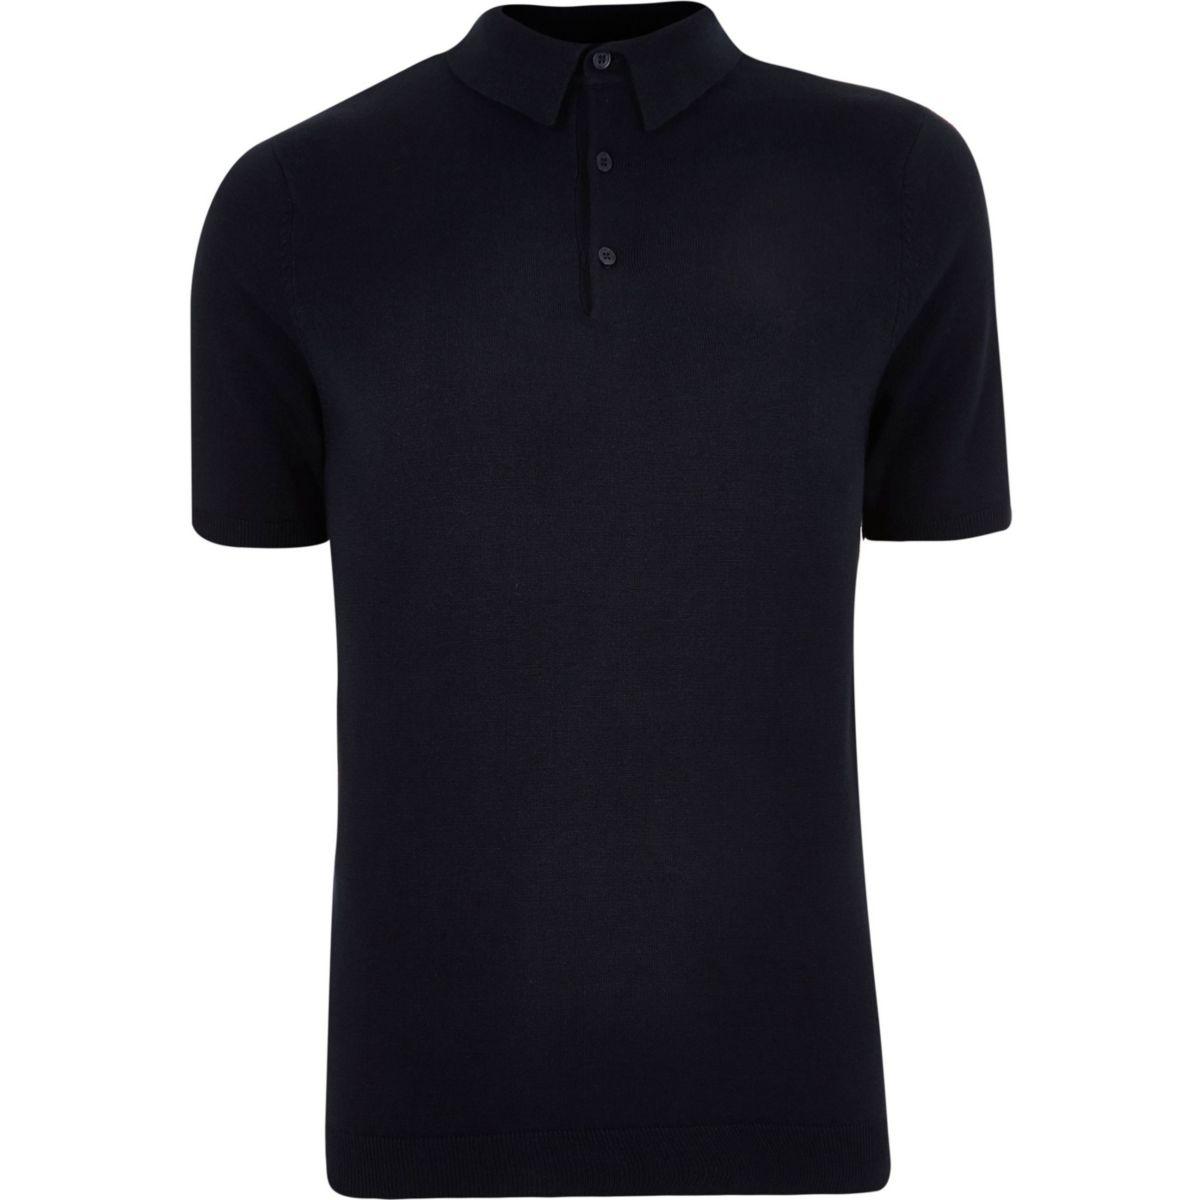 Big and Tall navy knit polo shirt